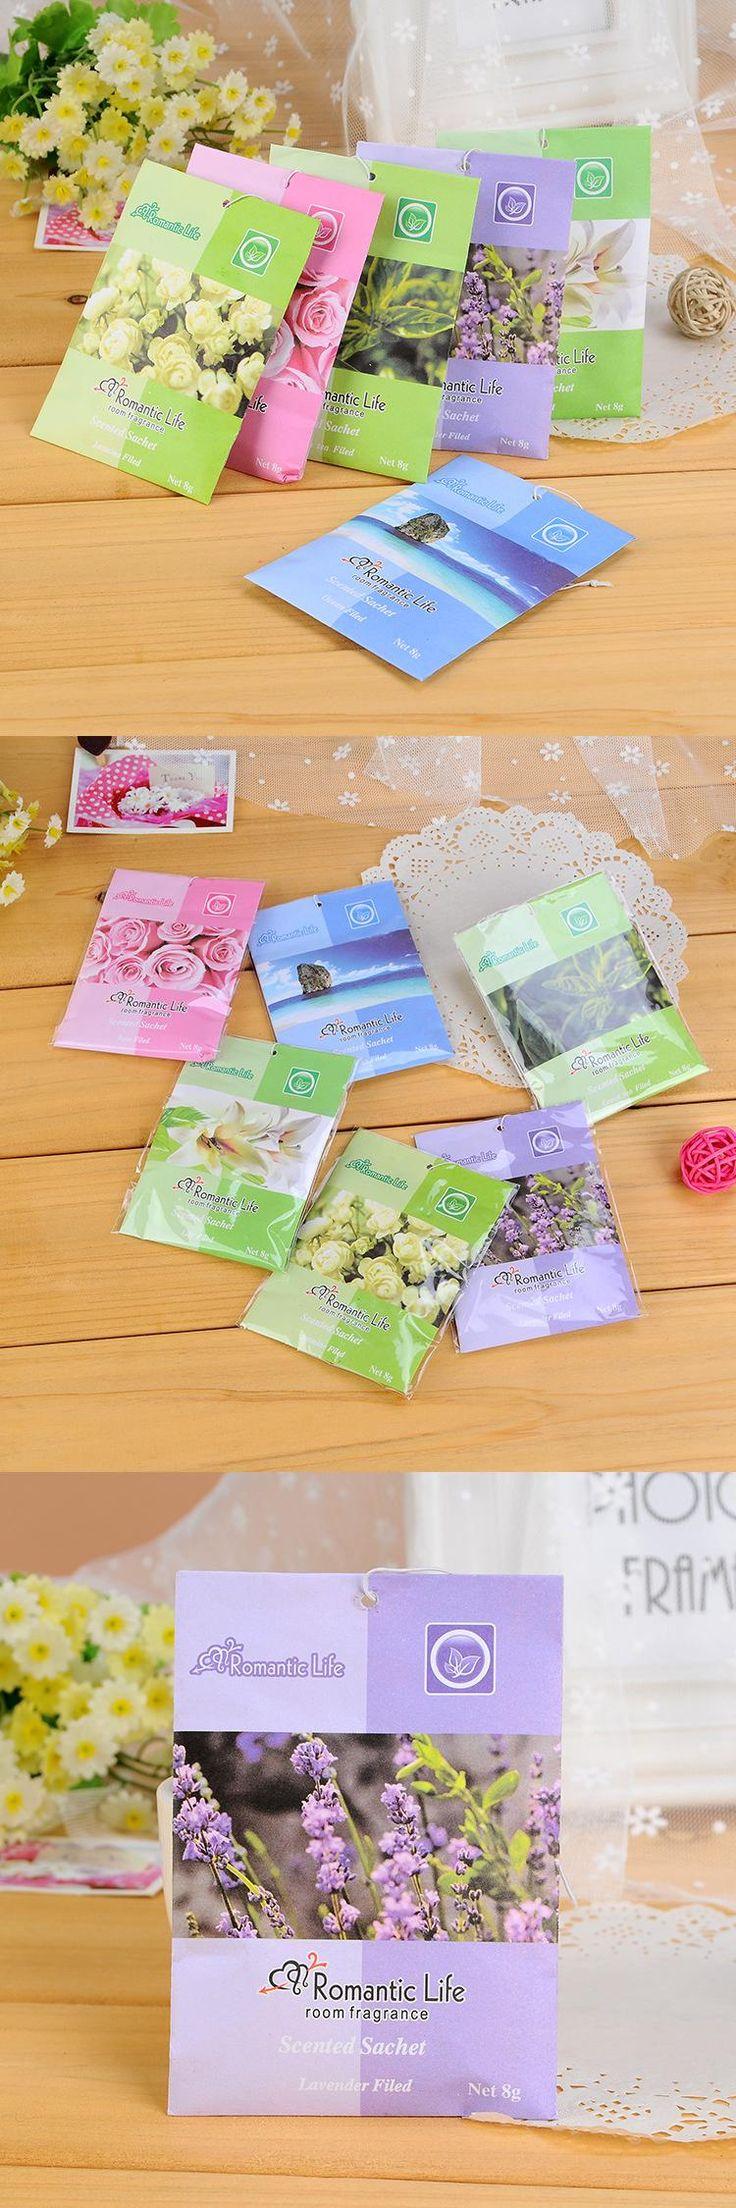 [Visit to Buy] Lovely 9 Taste Fresh Air Scented Fragrance Home Wardrobe Drawer Car Perfume Sachet Bag New 5pcs/pack #Advertisement